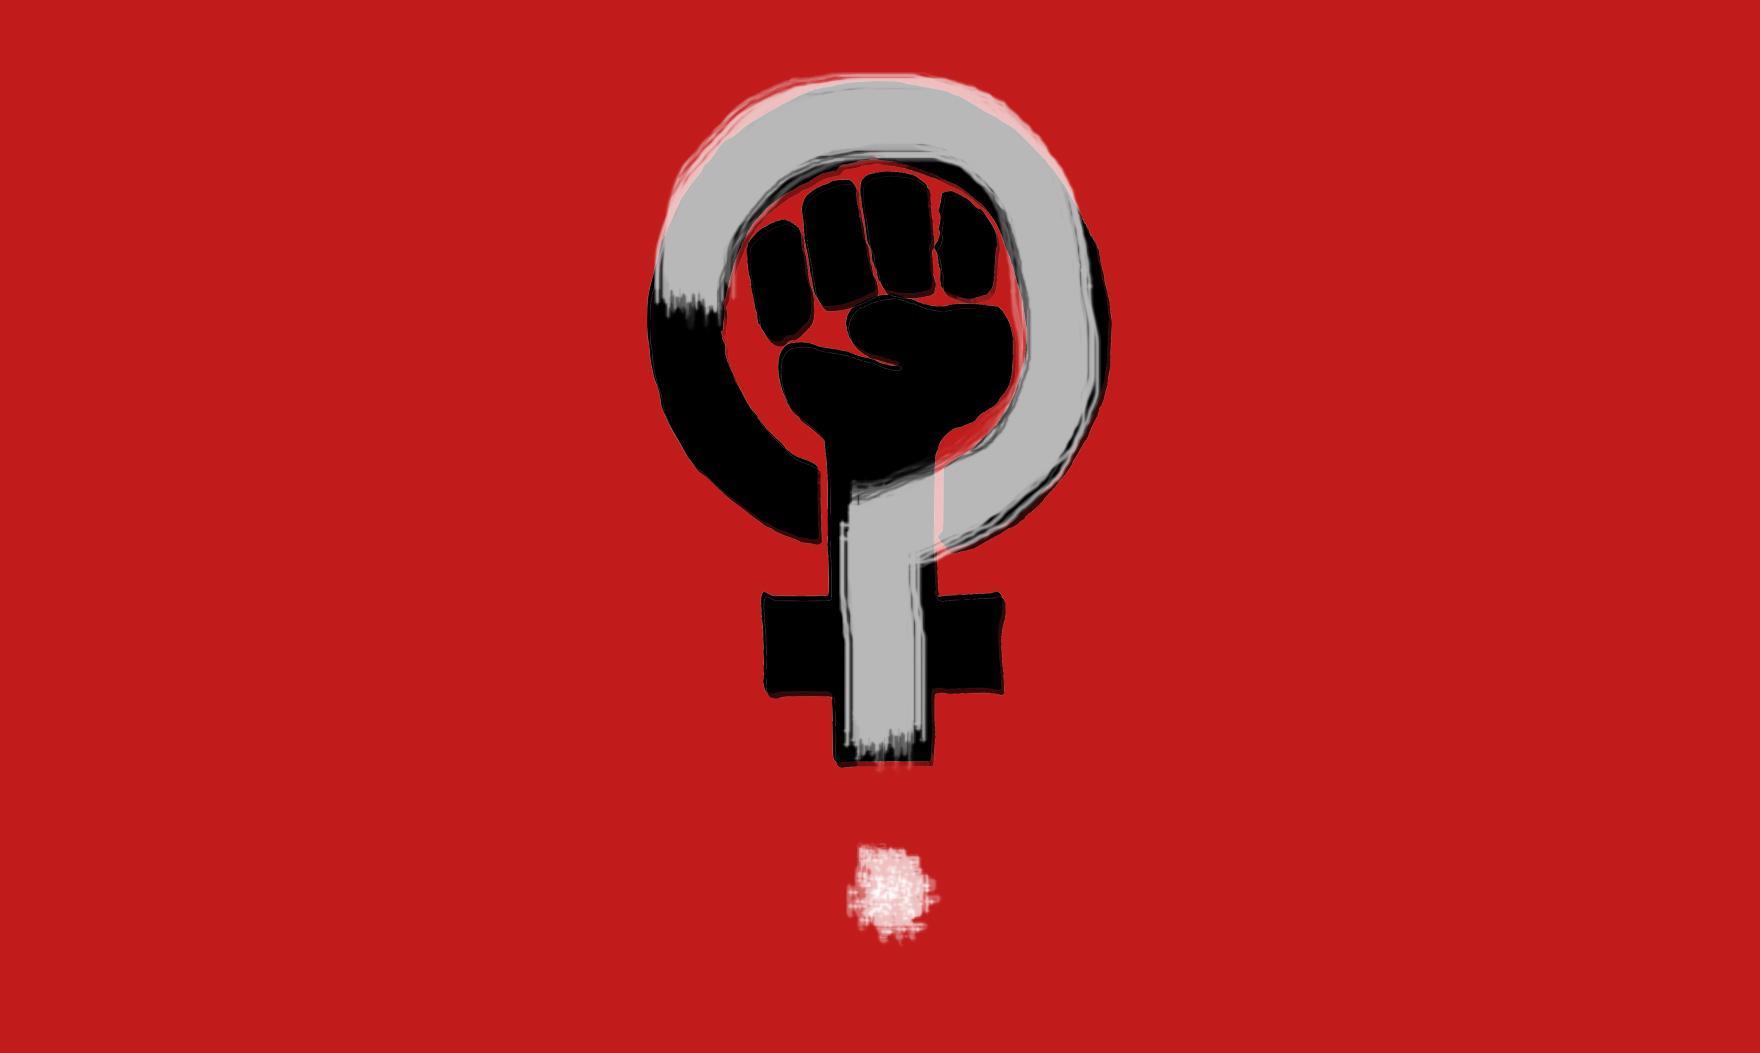 Feminism board should not be heavily censored